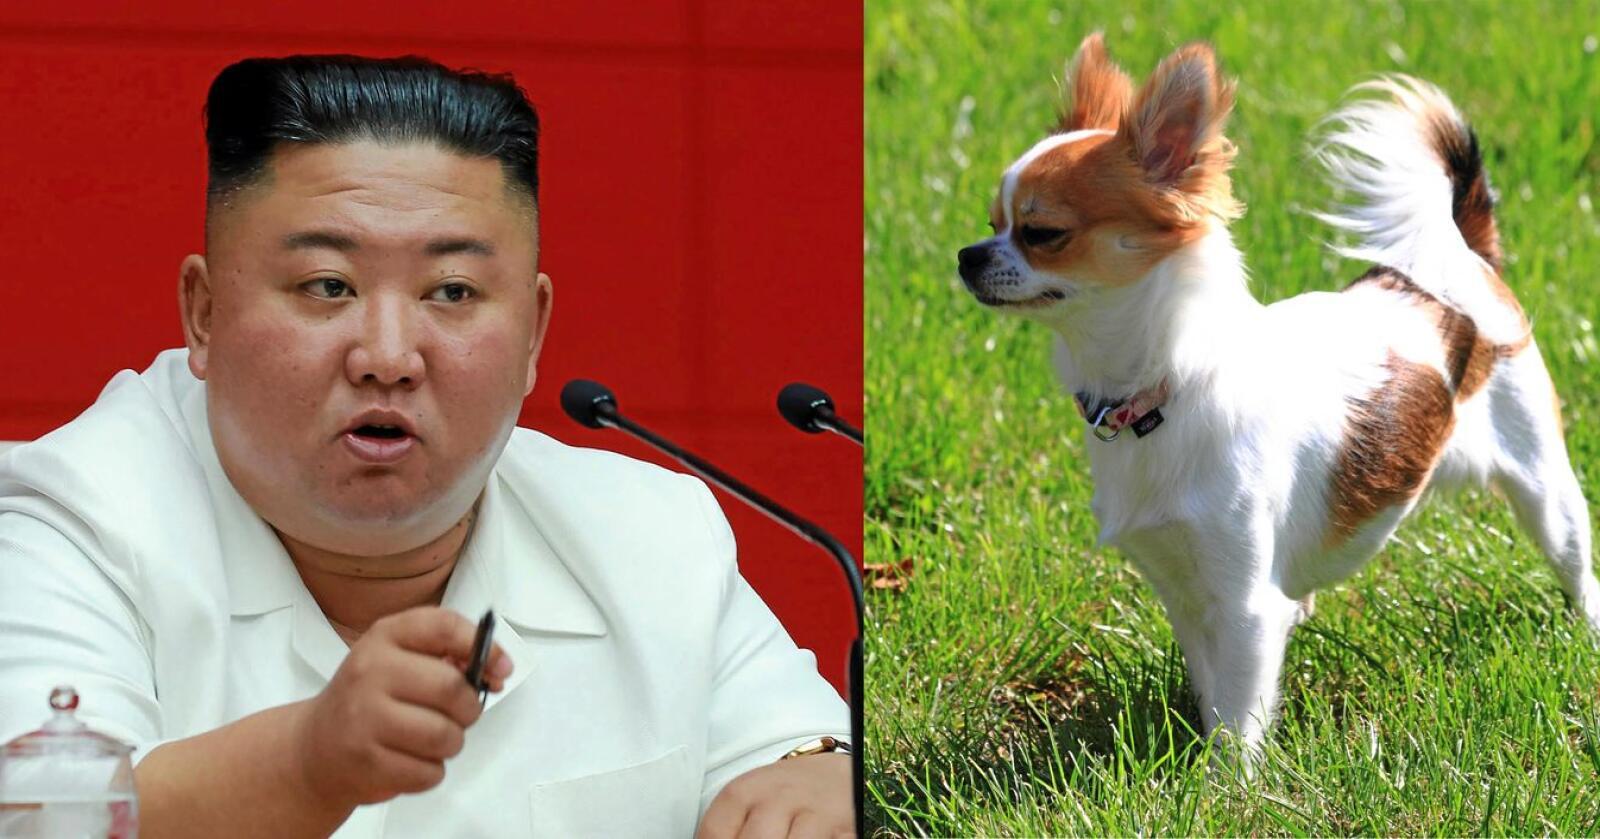 Illustrasjonsfoto: Korean Central News Agency/Korea News Service via AP/Jiri Vaclavek/Mostphoto